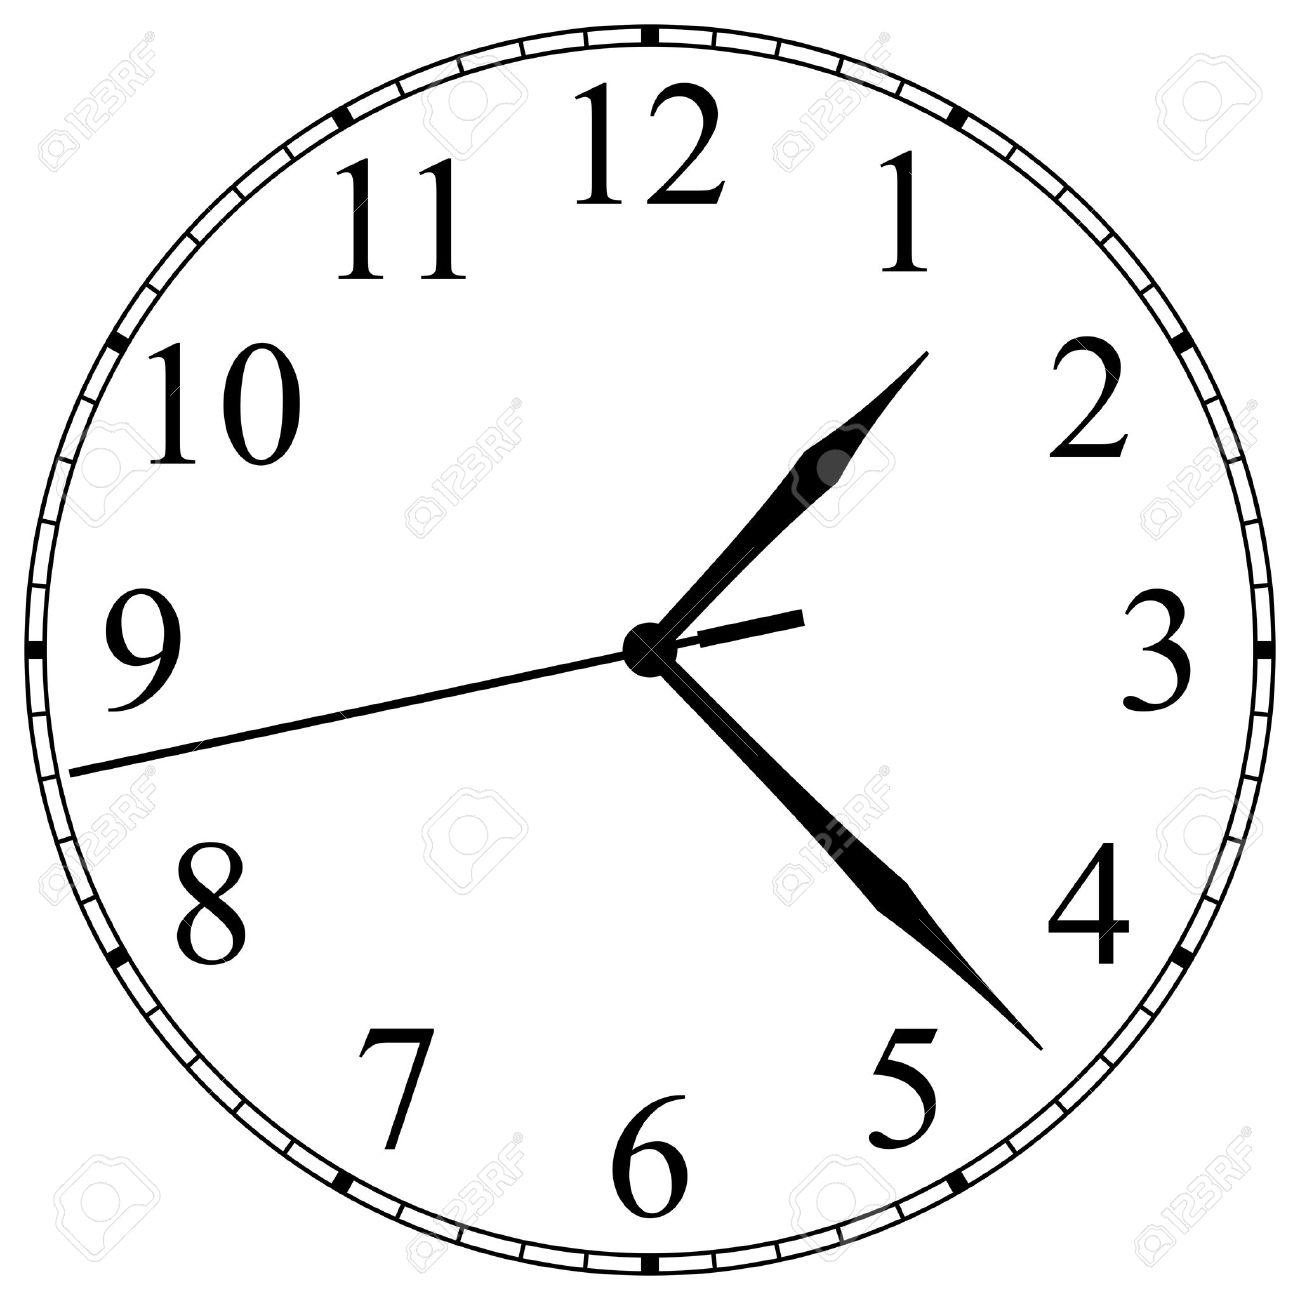 Clock-Face - 5452666